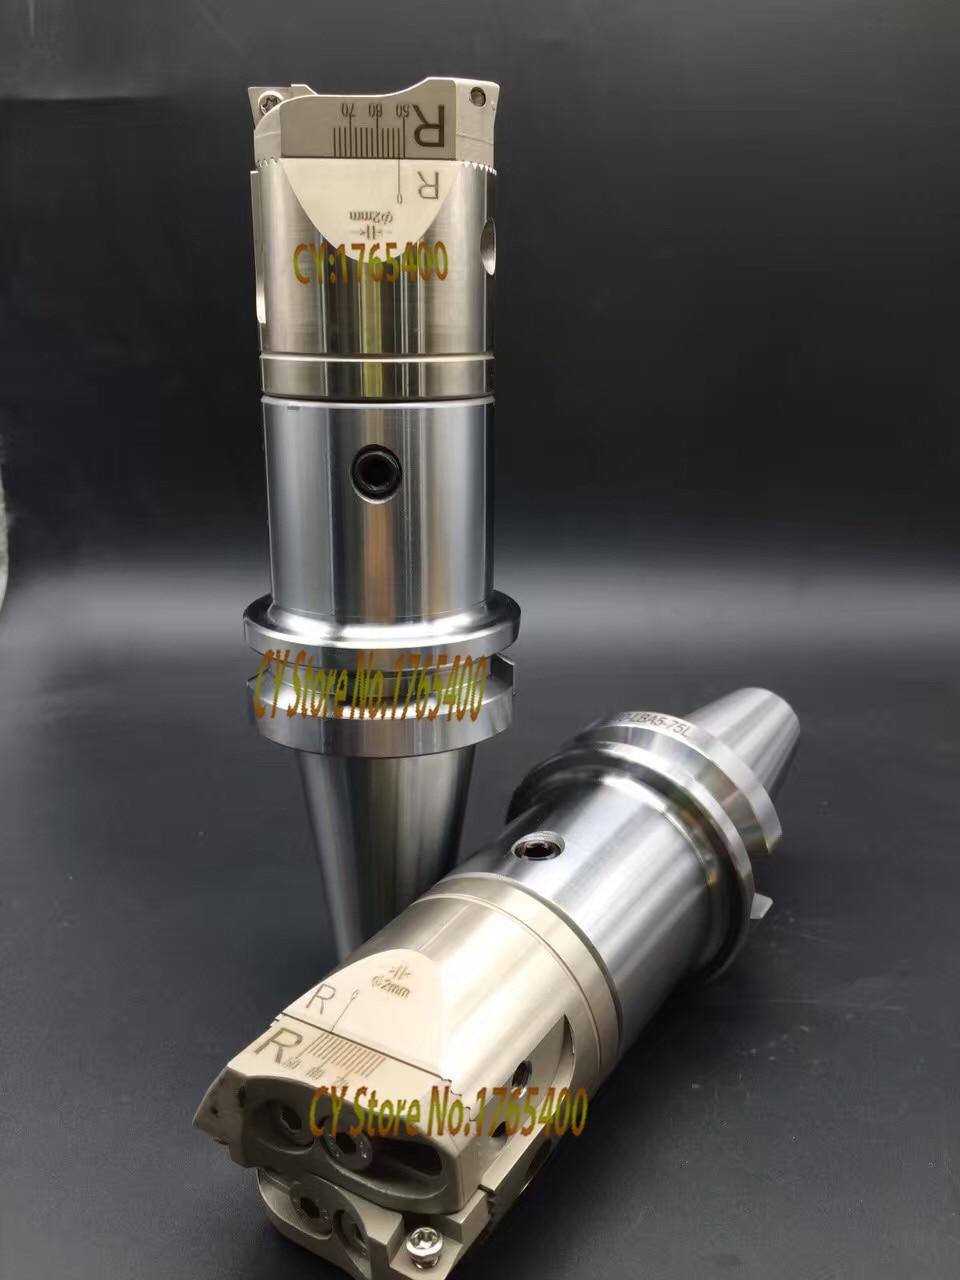 BT40-LBK4-175L-M16 Arbor RBH 40-55mm High precision Twin-bit Rough Boring Head used for deep holes +10pcs CCMT09T304 inserts